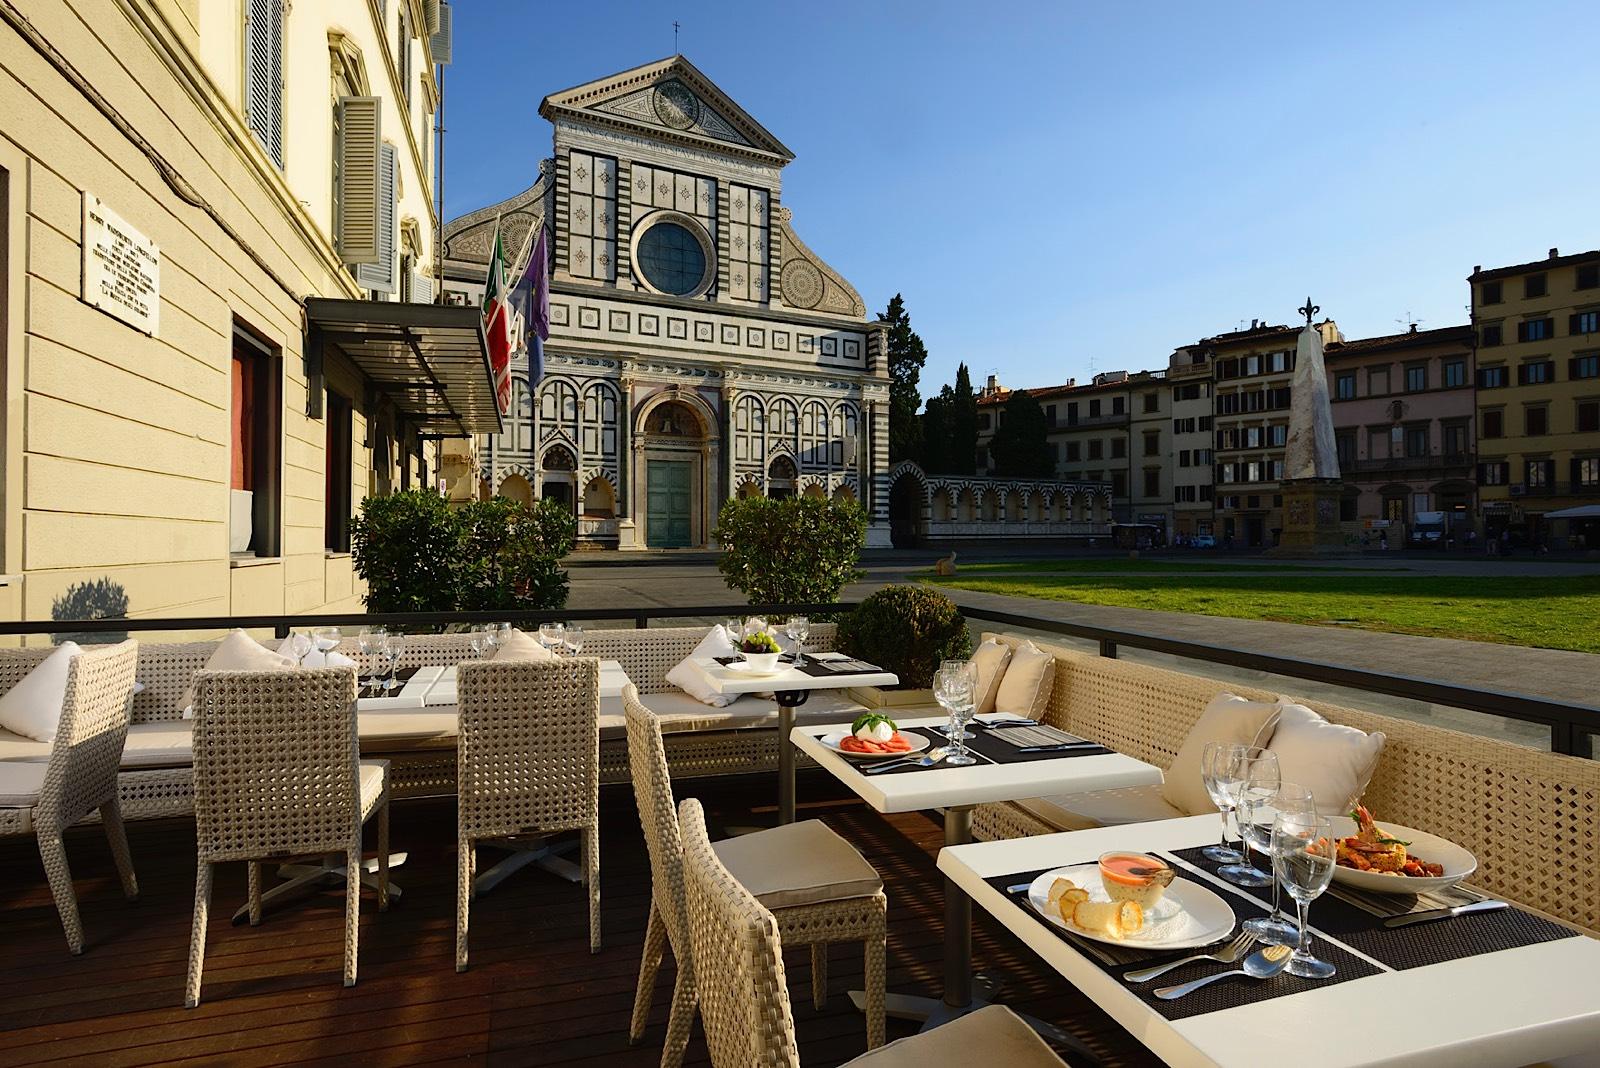 Best Florence Restaurant - La Buona Novella in Grand Hotel Minerva